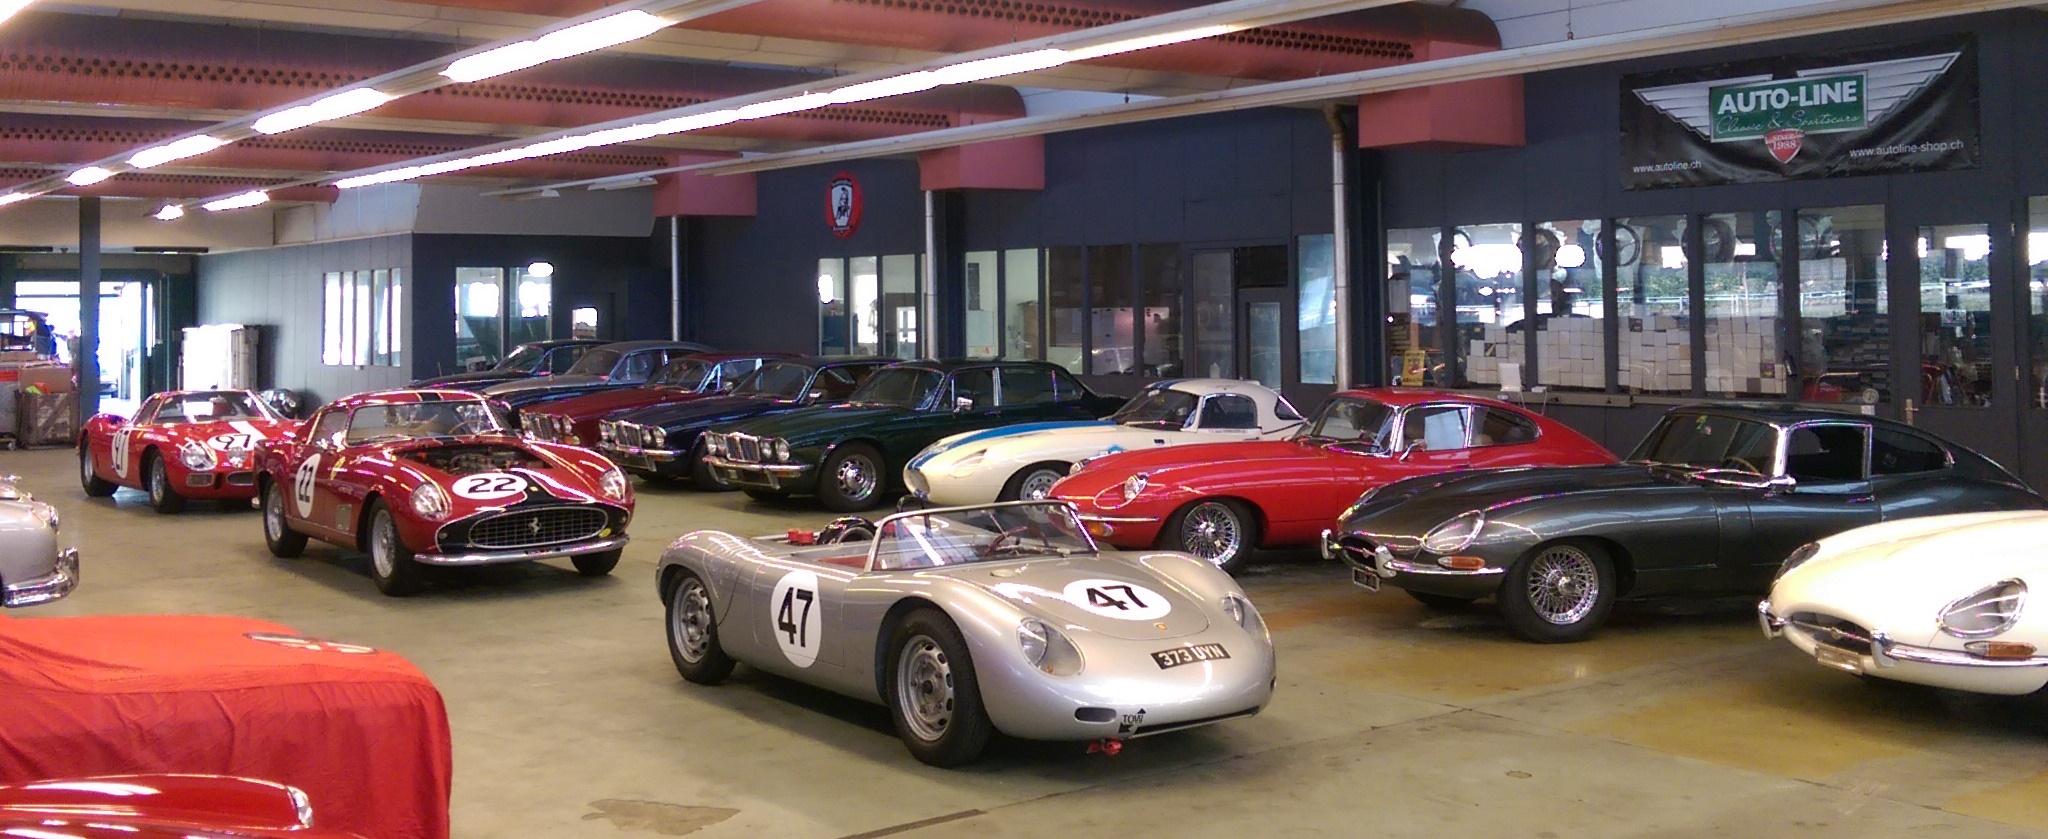 Auto-Line Showroom